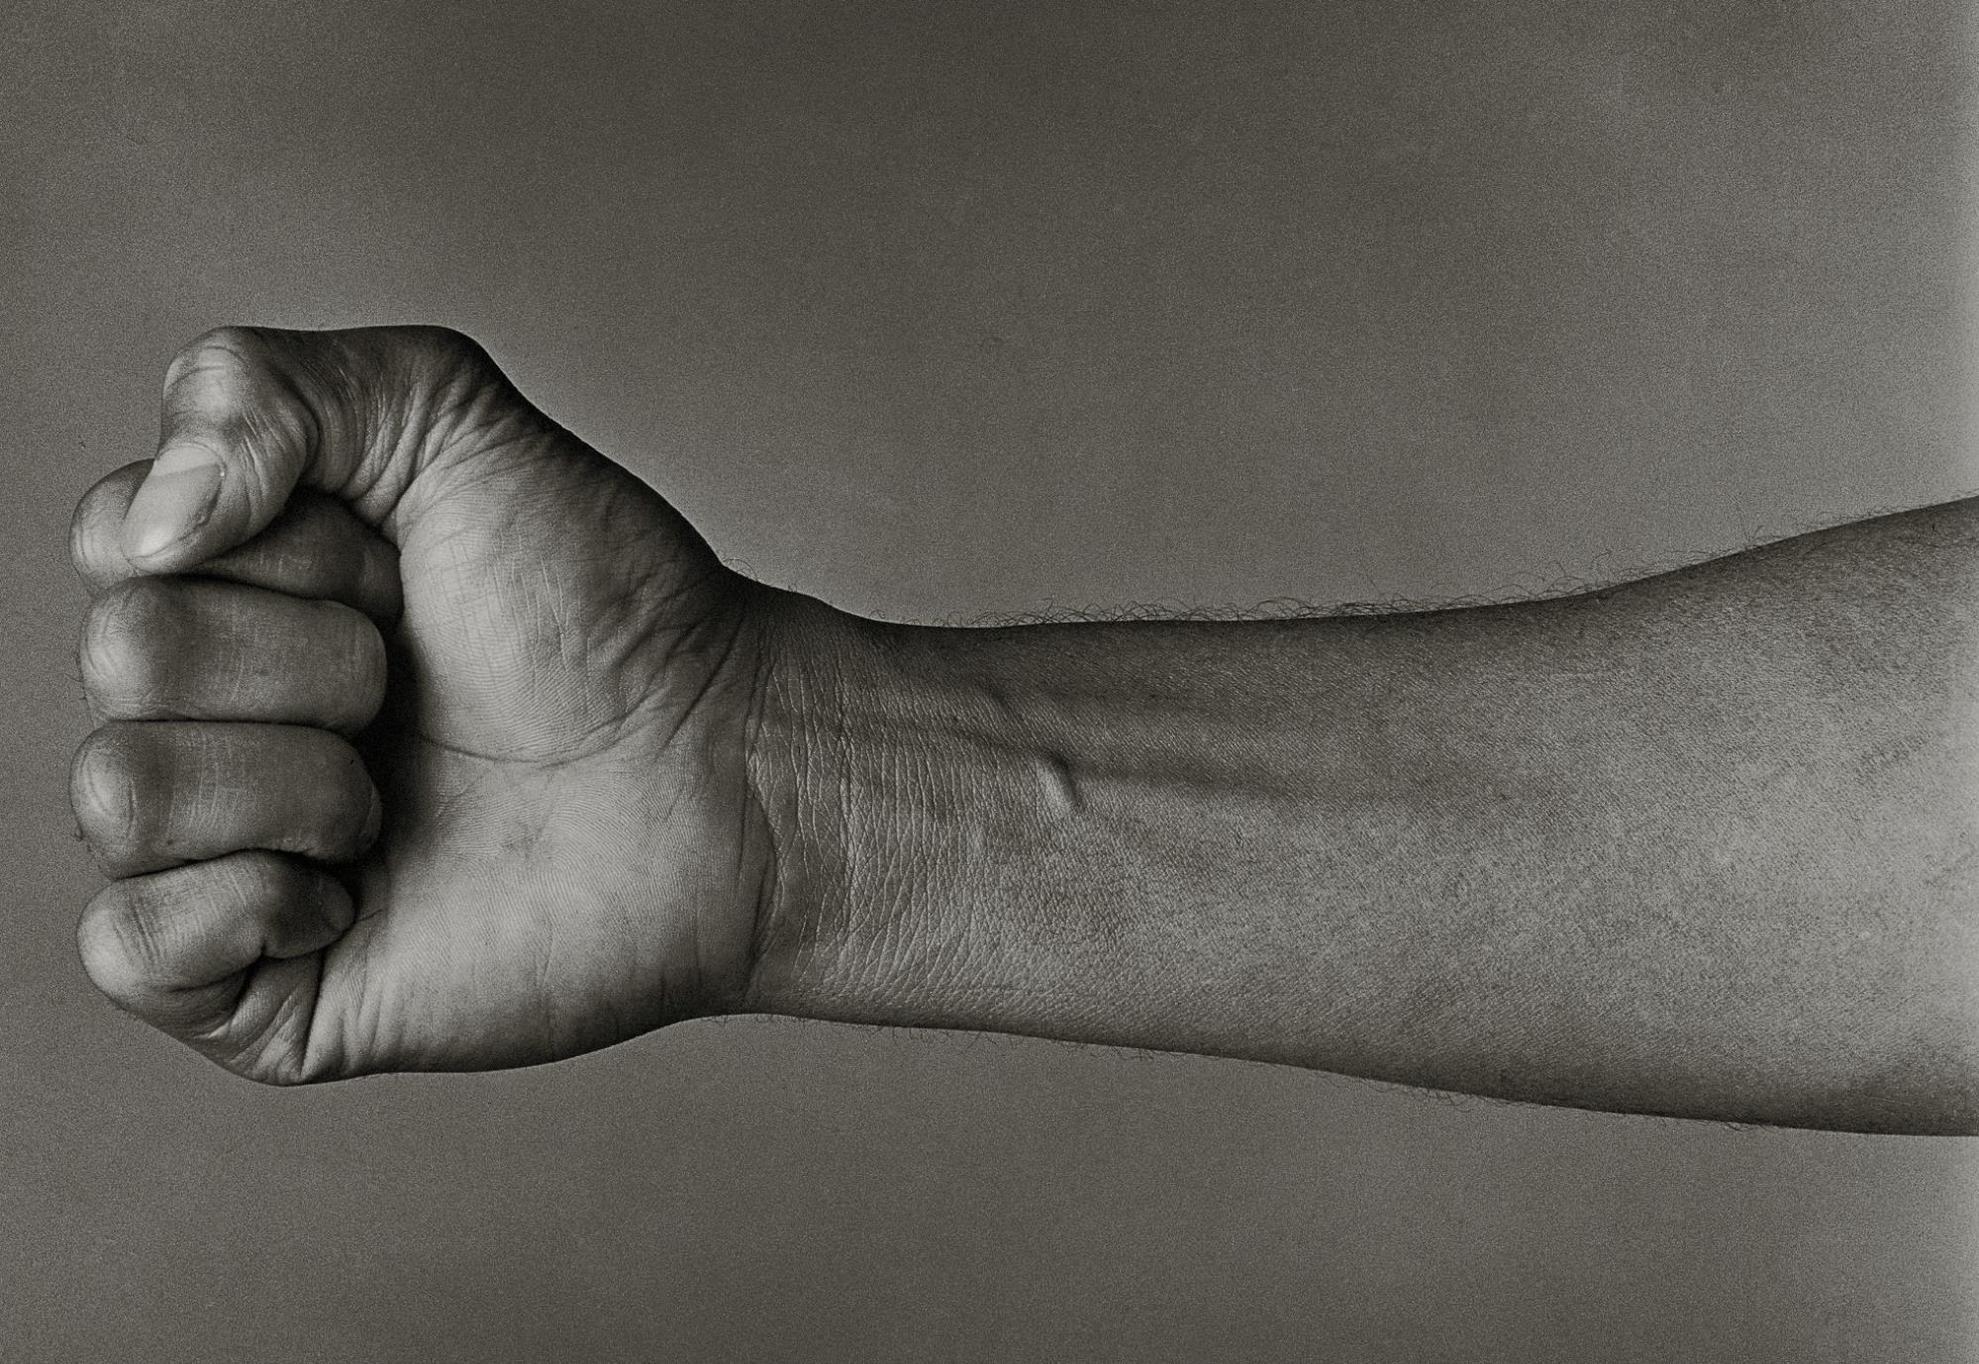 John Stewart - Muhammad Ali, 'Fist & Arm', Chicago-1977